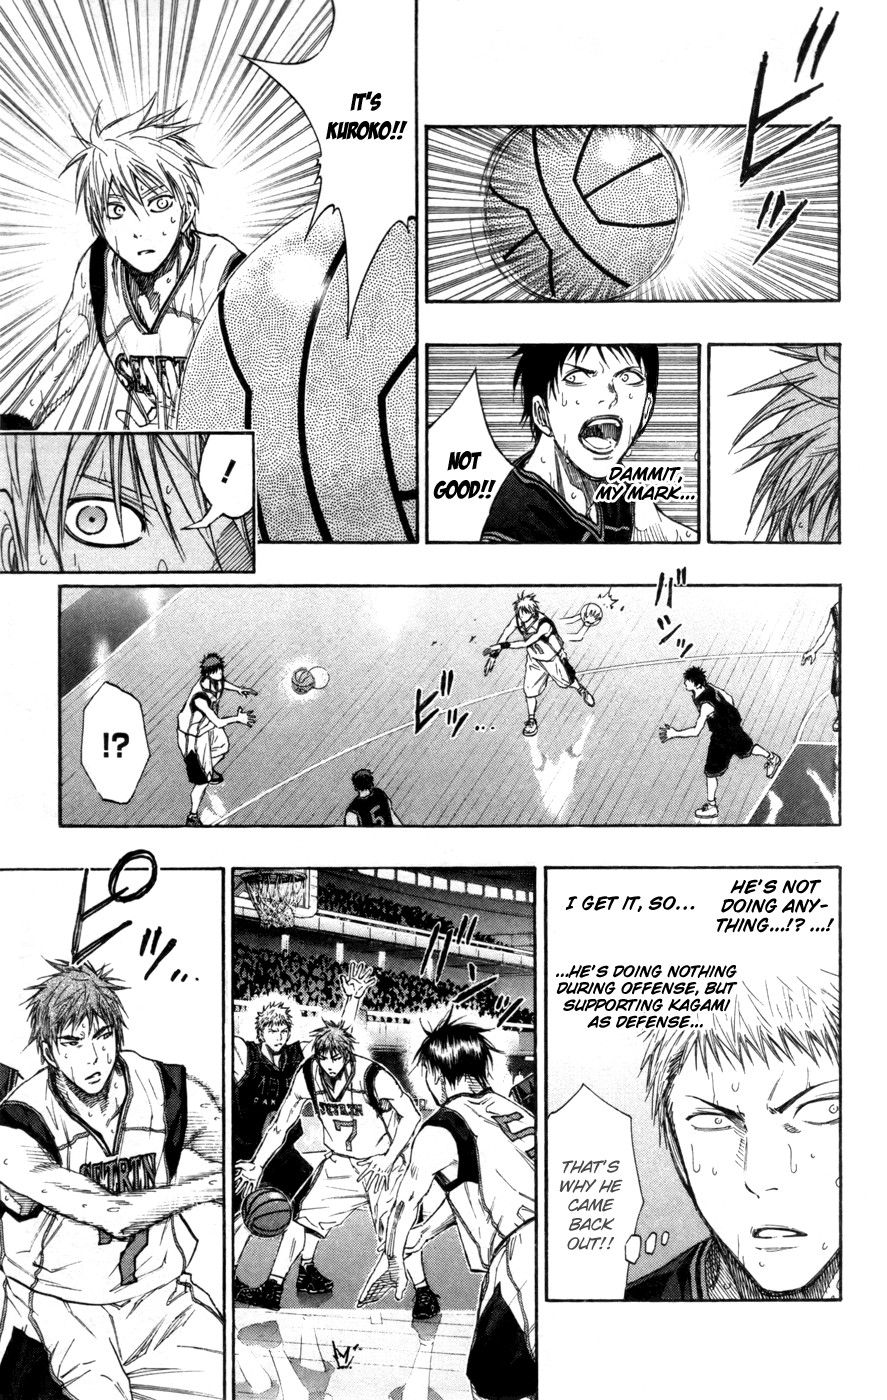 Kuroko no Basket Manga Chapter 125 - Image 11